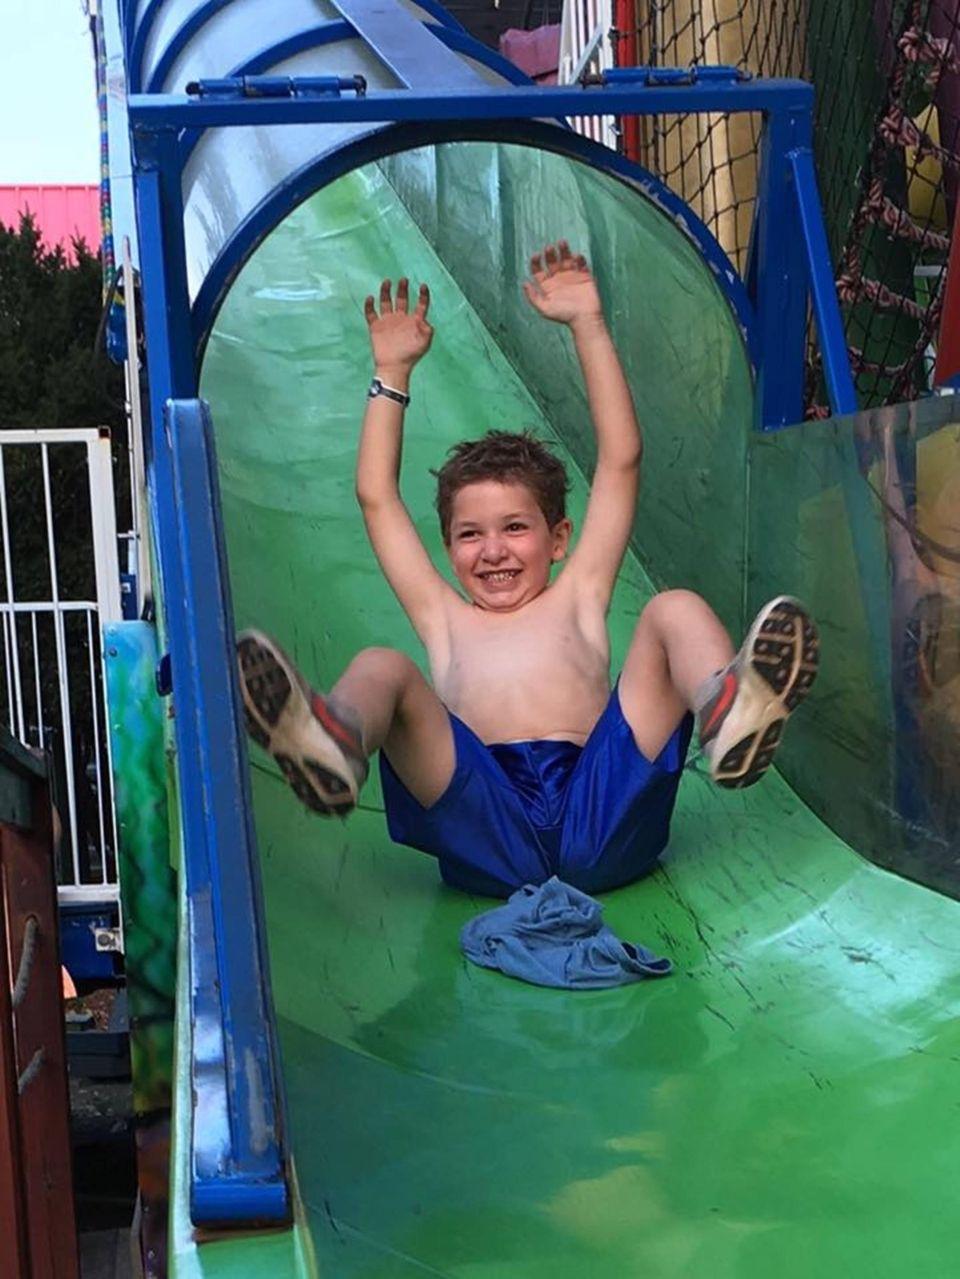 Aaron six years old from Syosset LI having